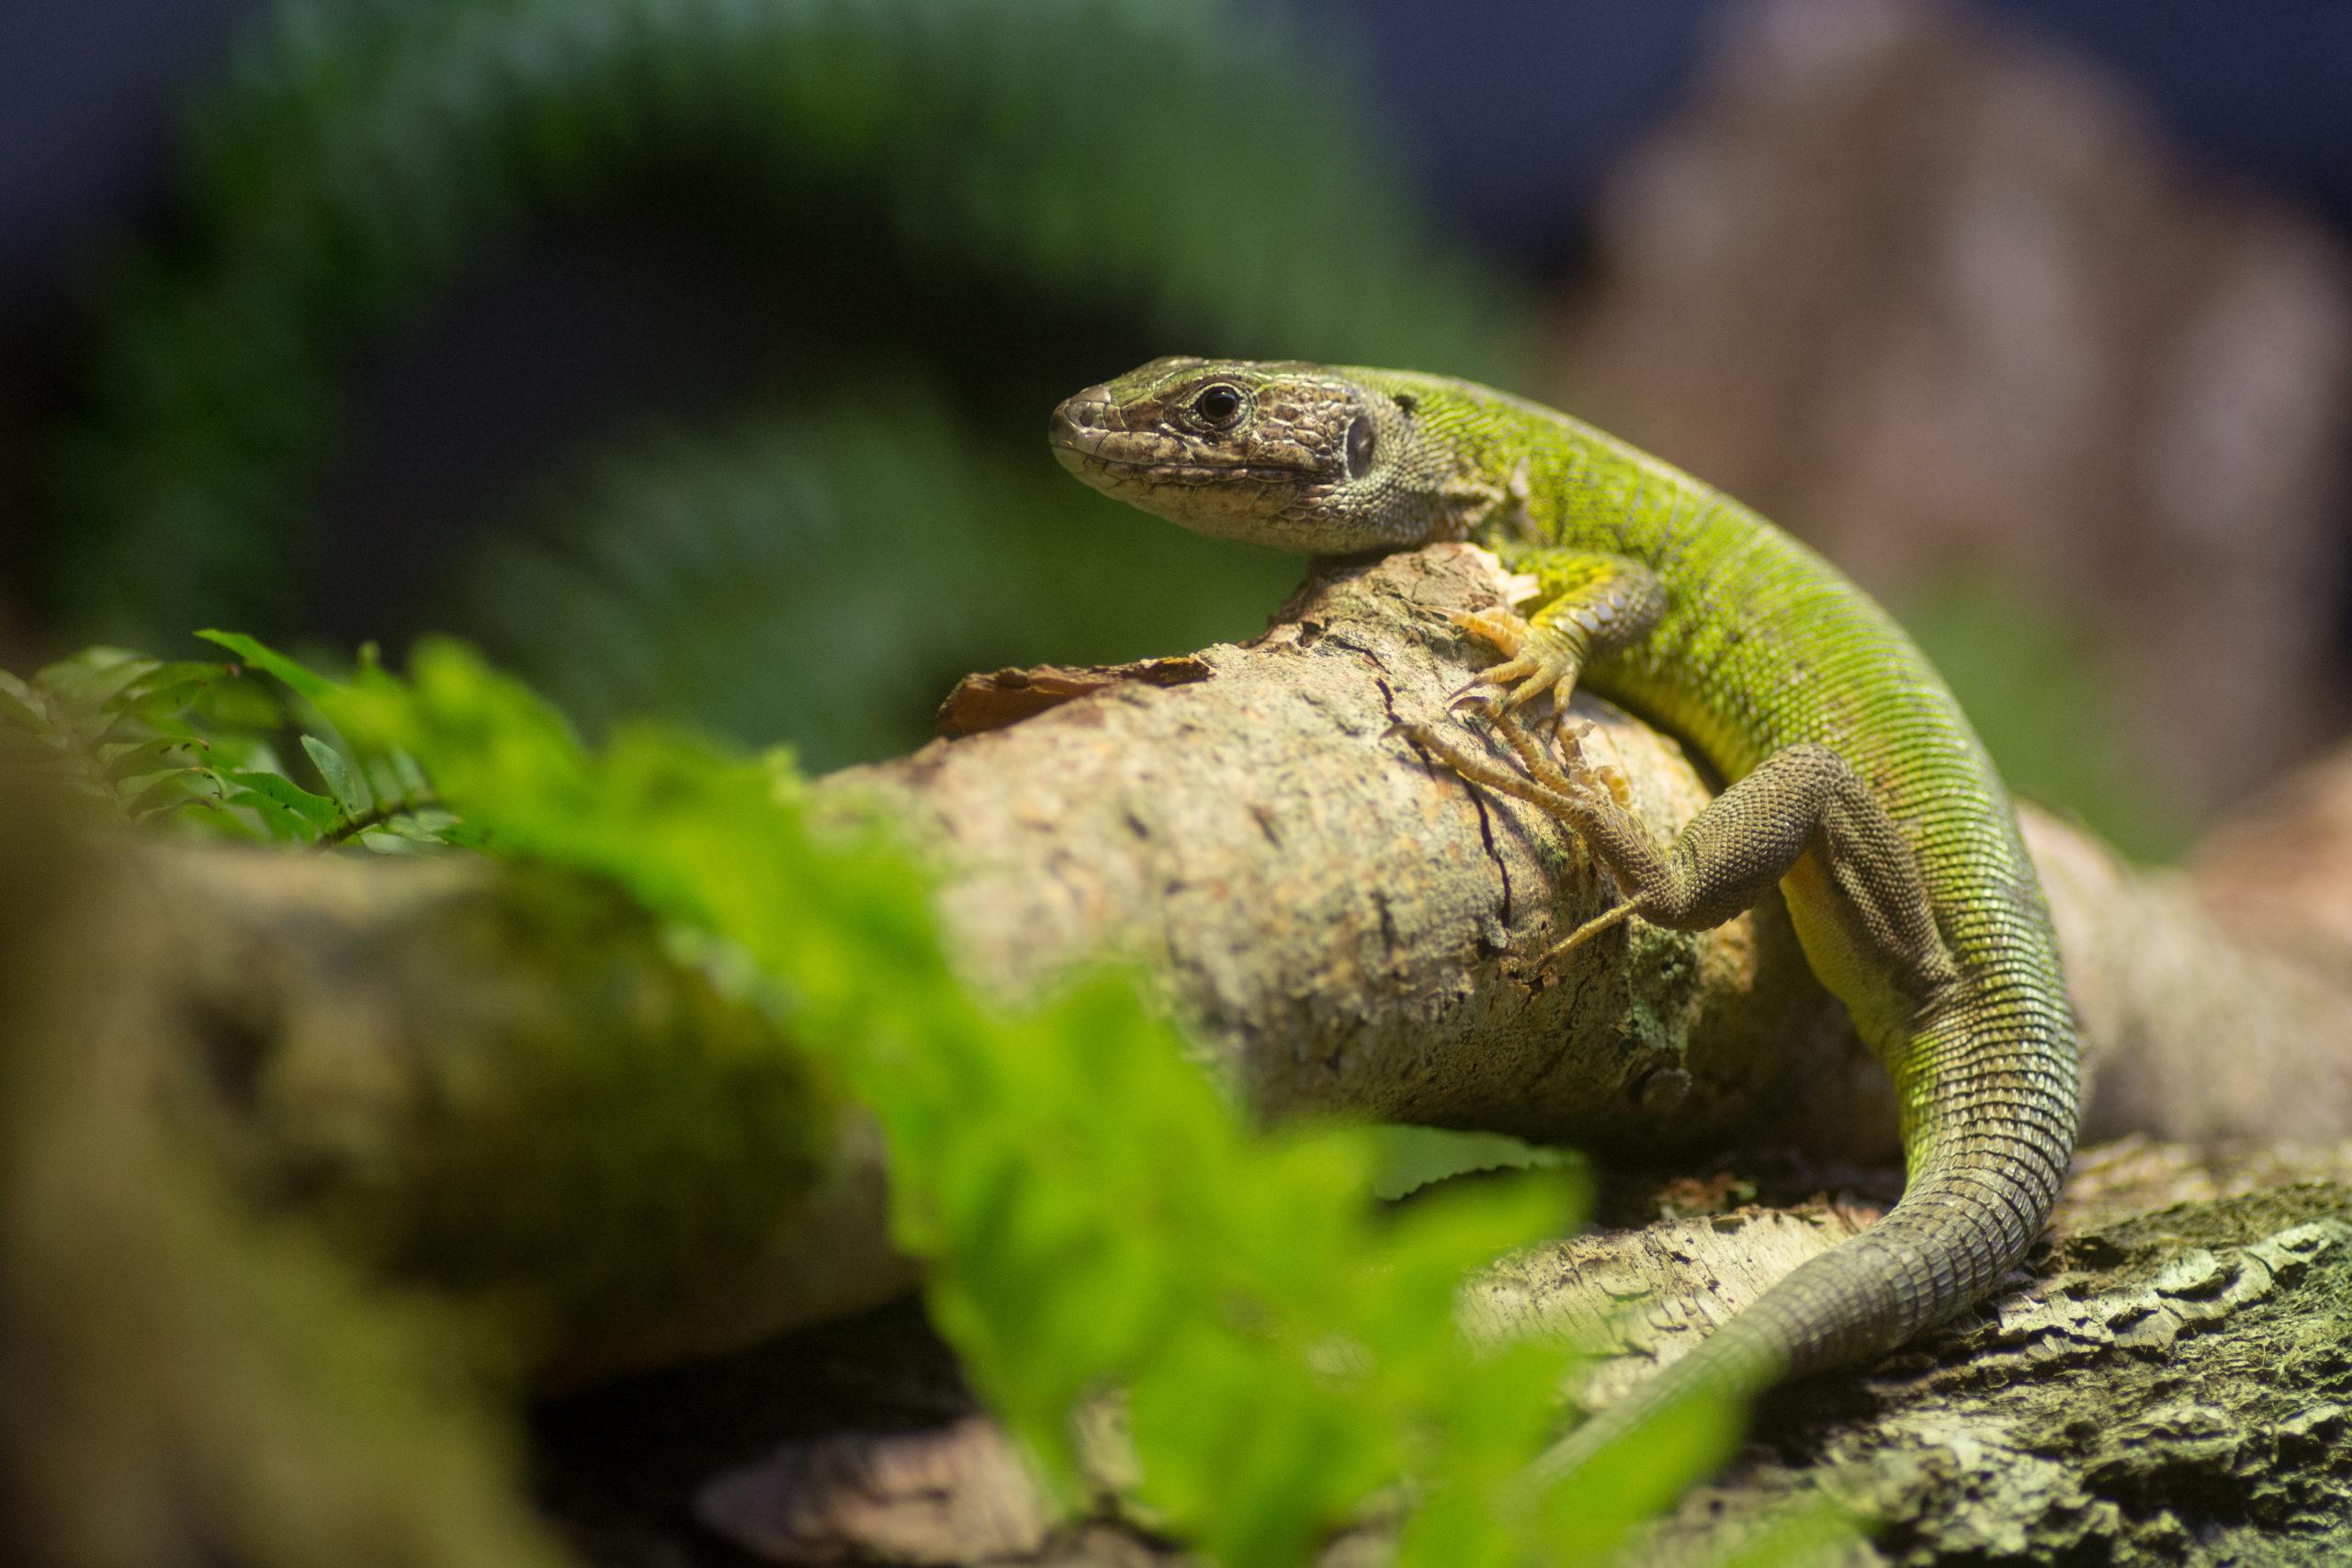 Un lézard vert dans un terrarium de Micro Zoo